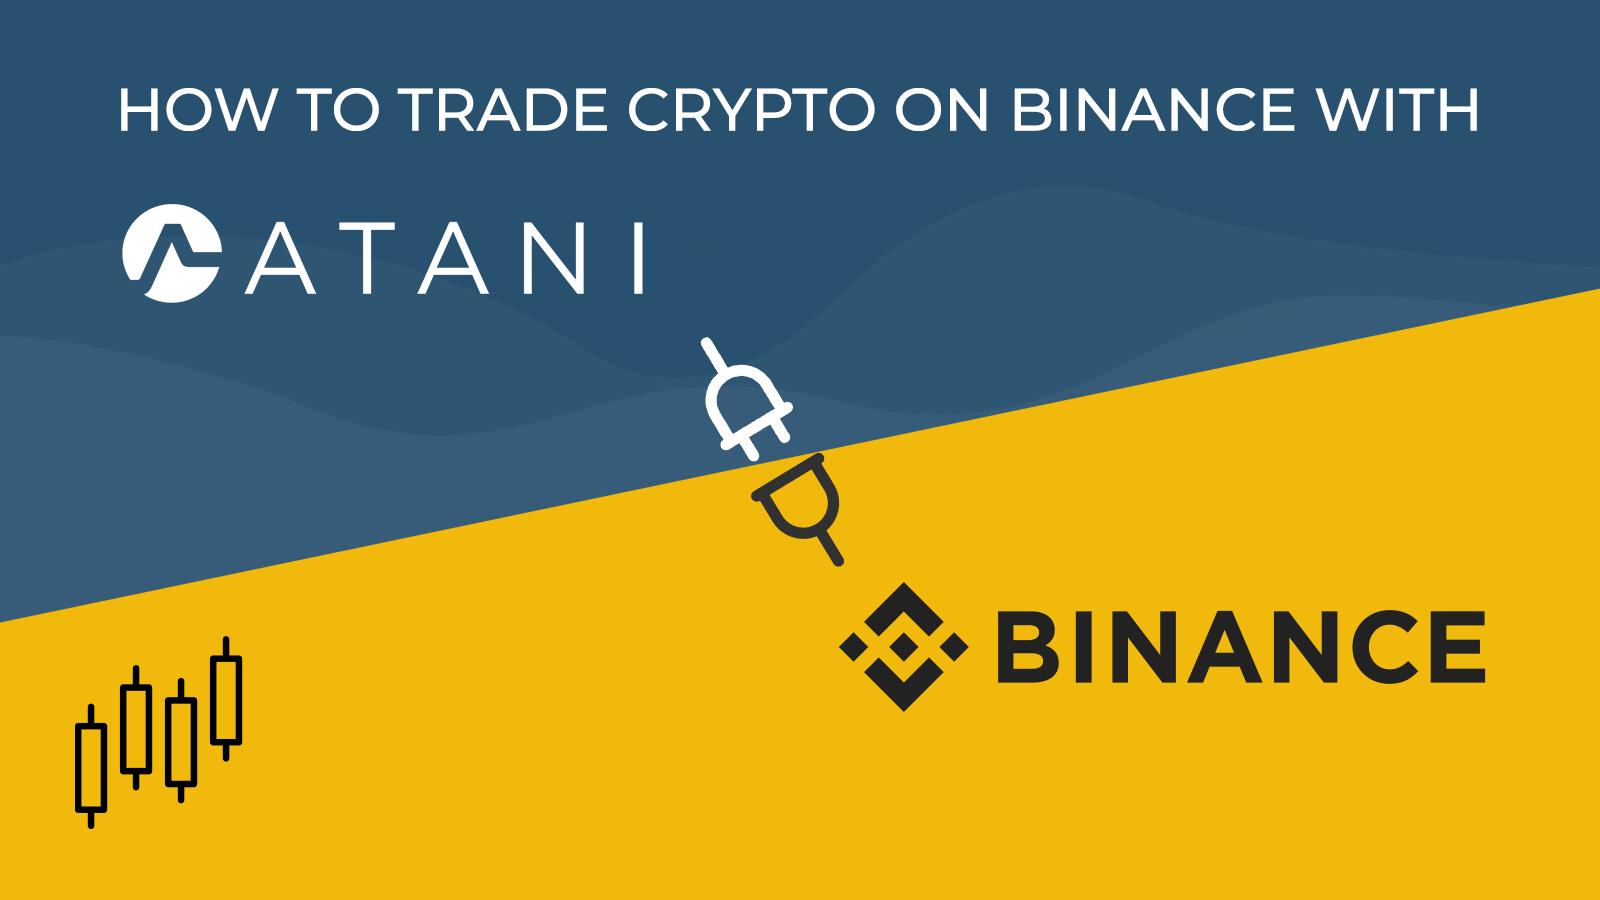 How to trade crypto on Binance using Atani